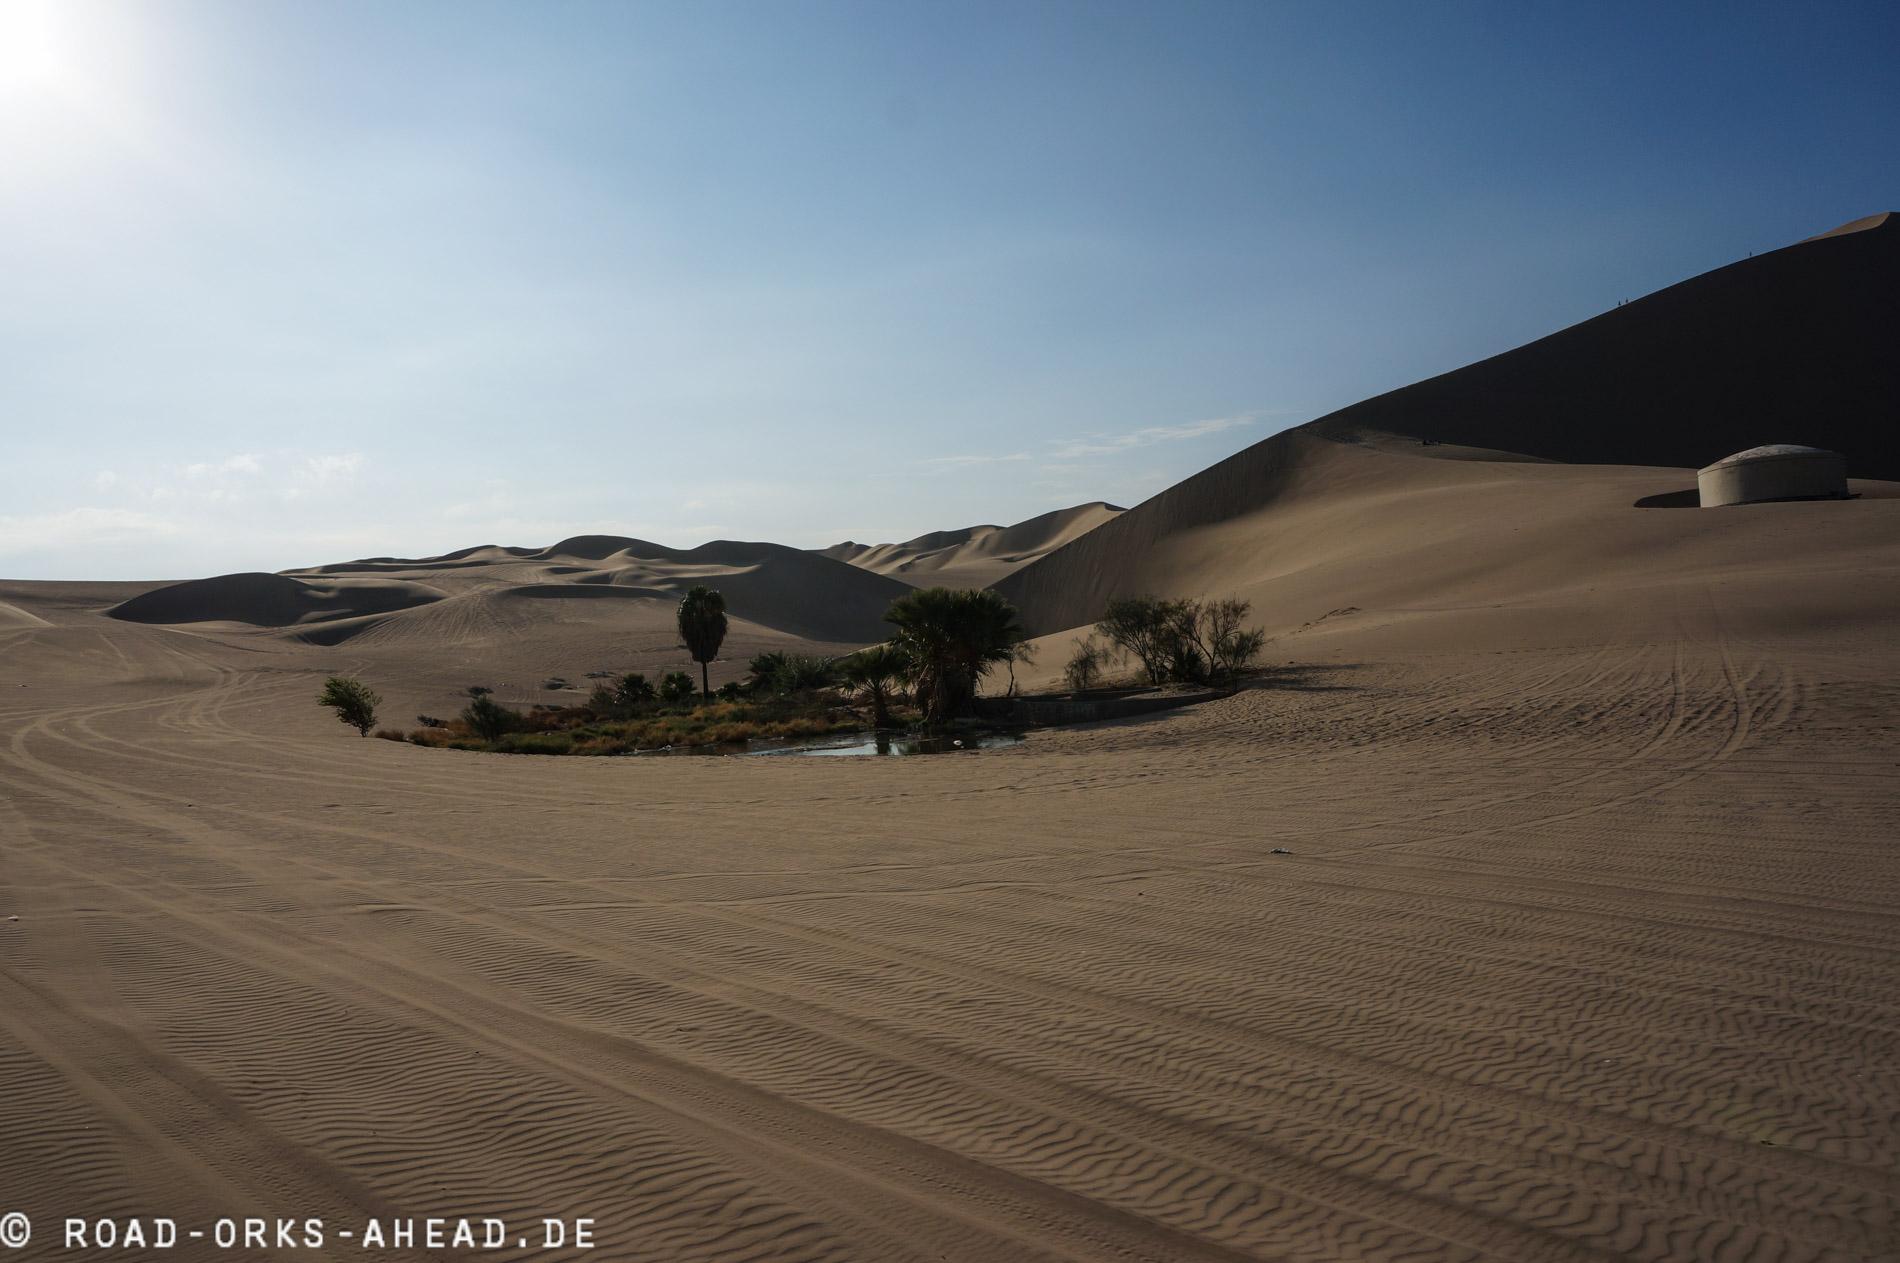 Wüstenoase